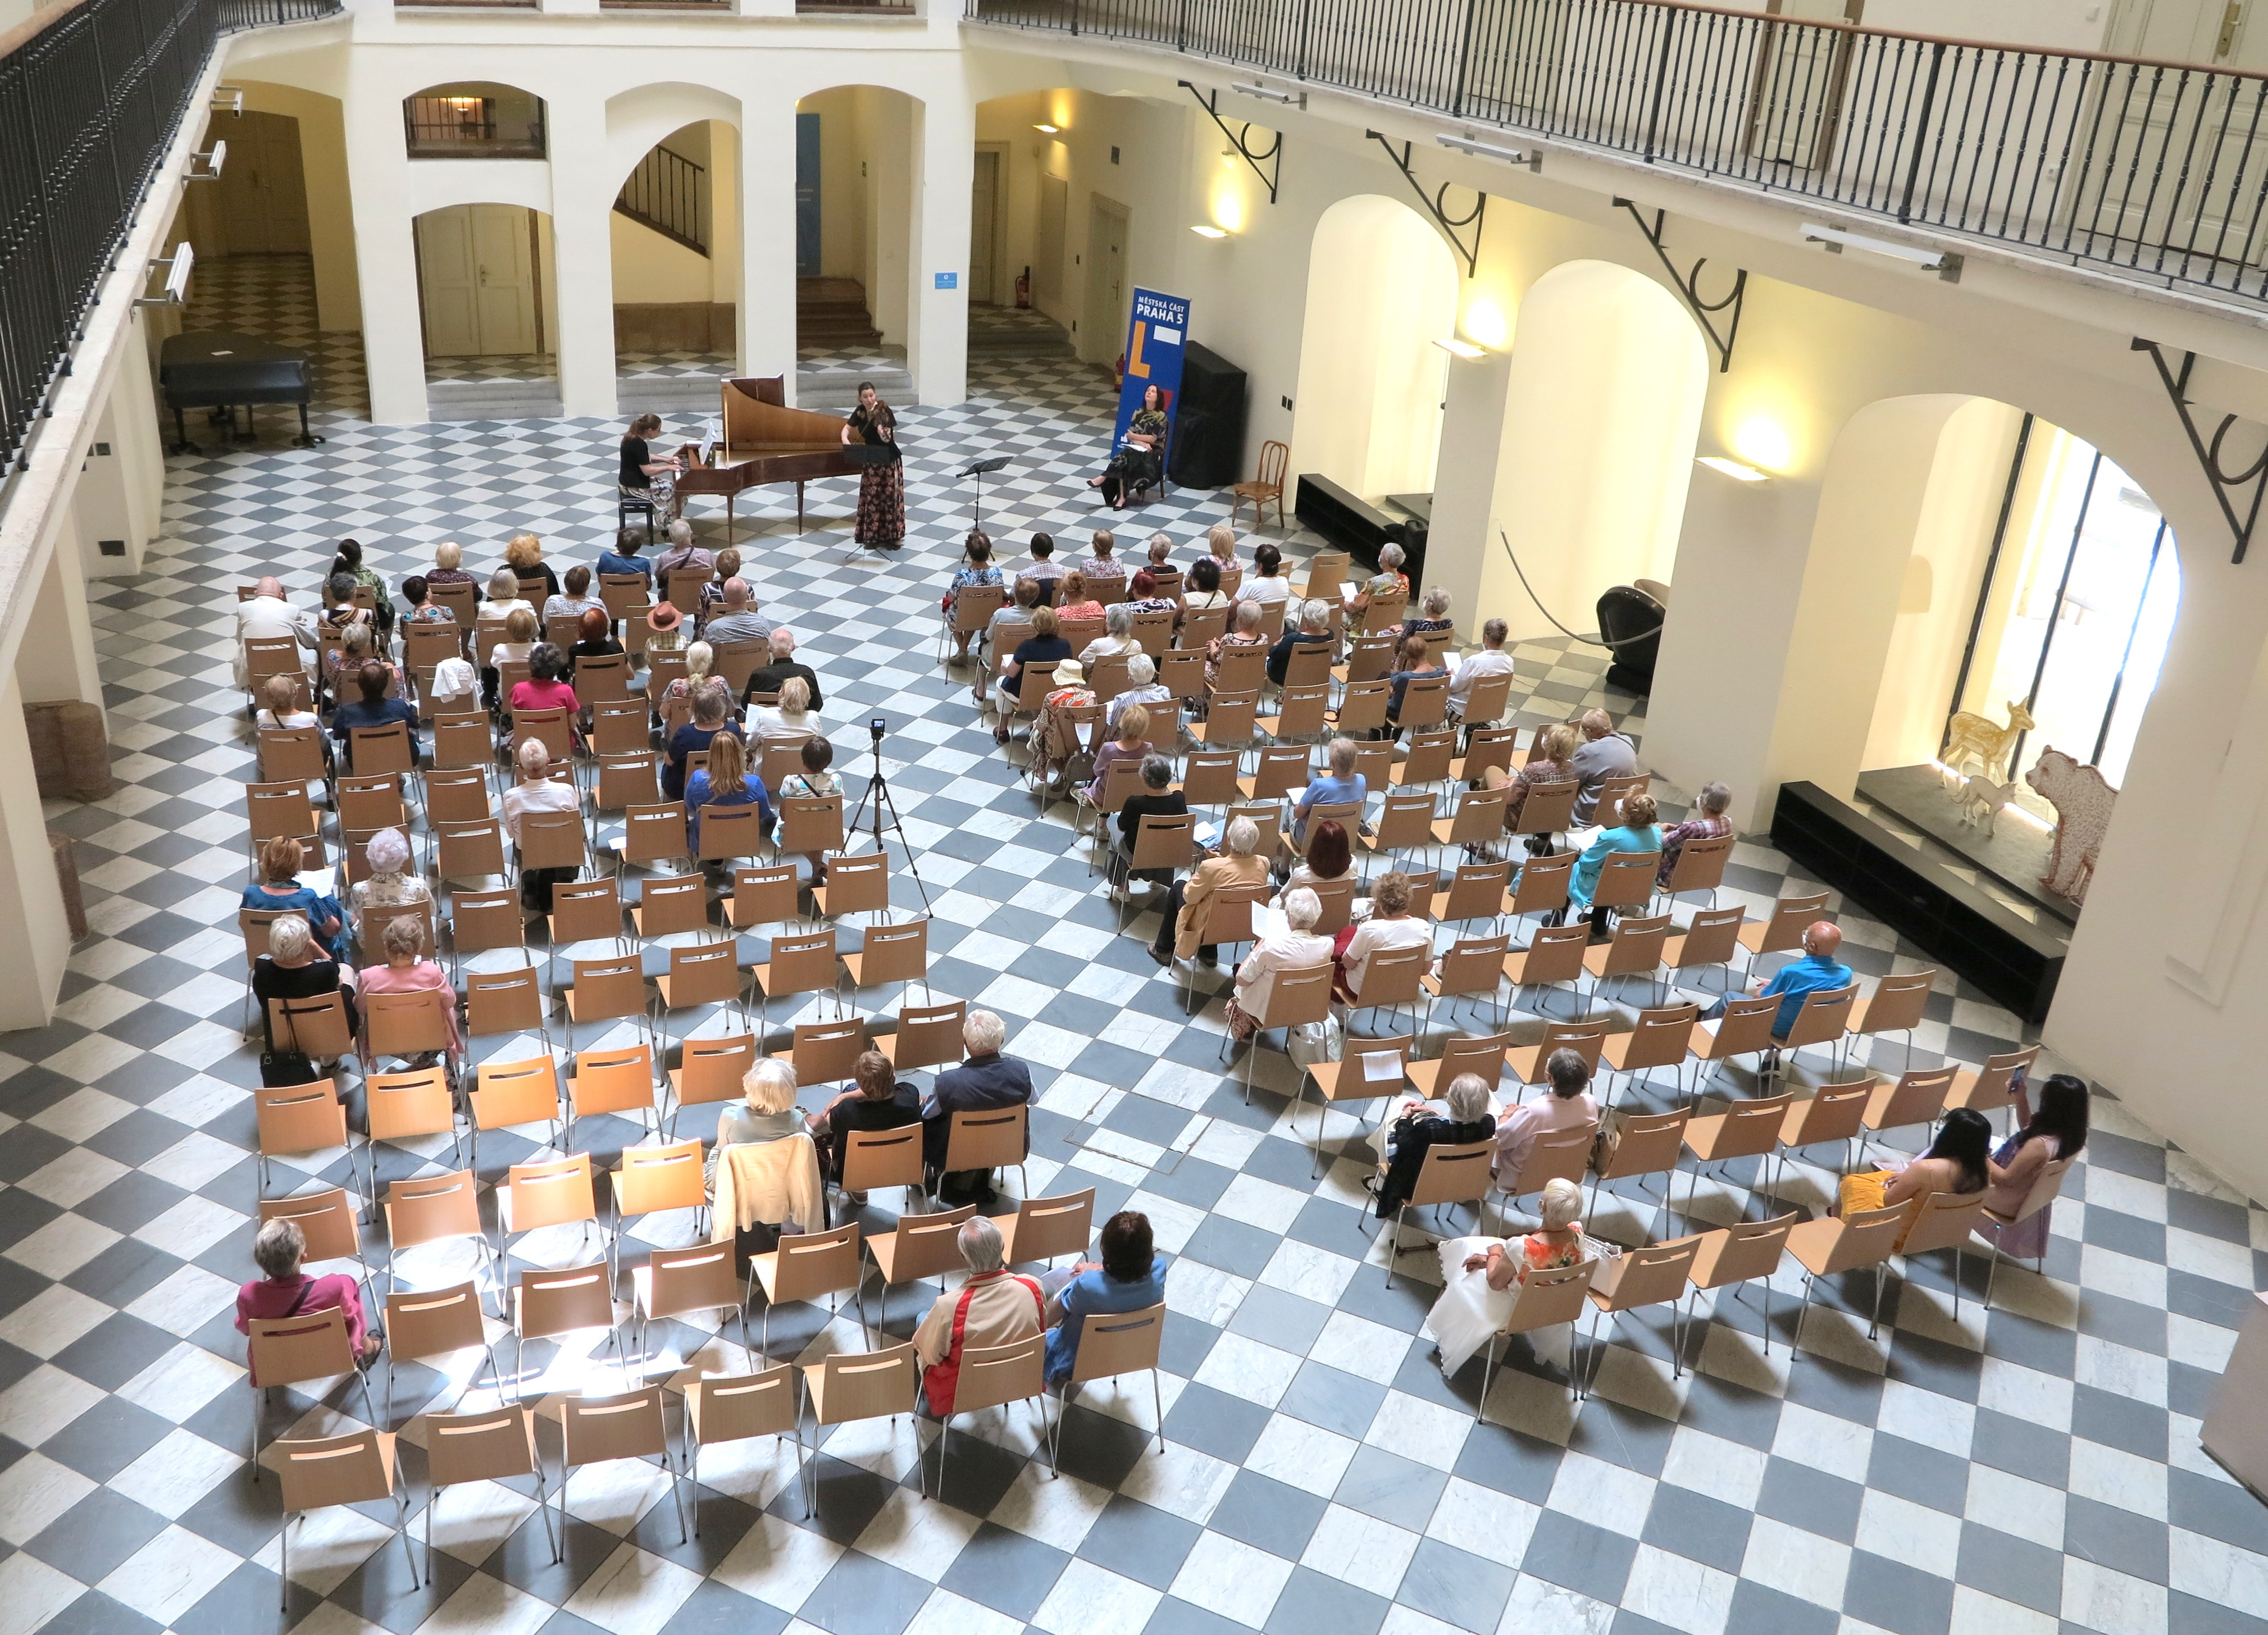 dalsi-koncerty-projektu-andelska-matine-v-ceskem-muzeu-hudby